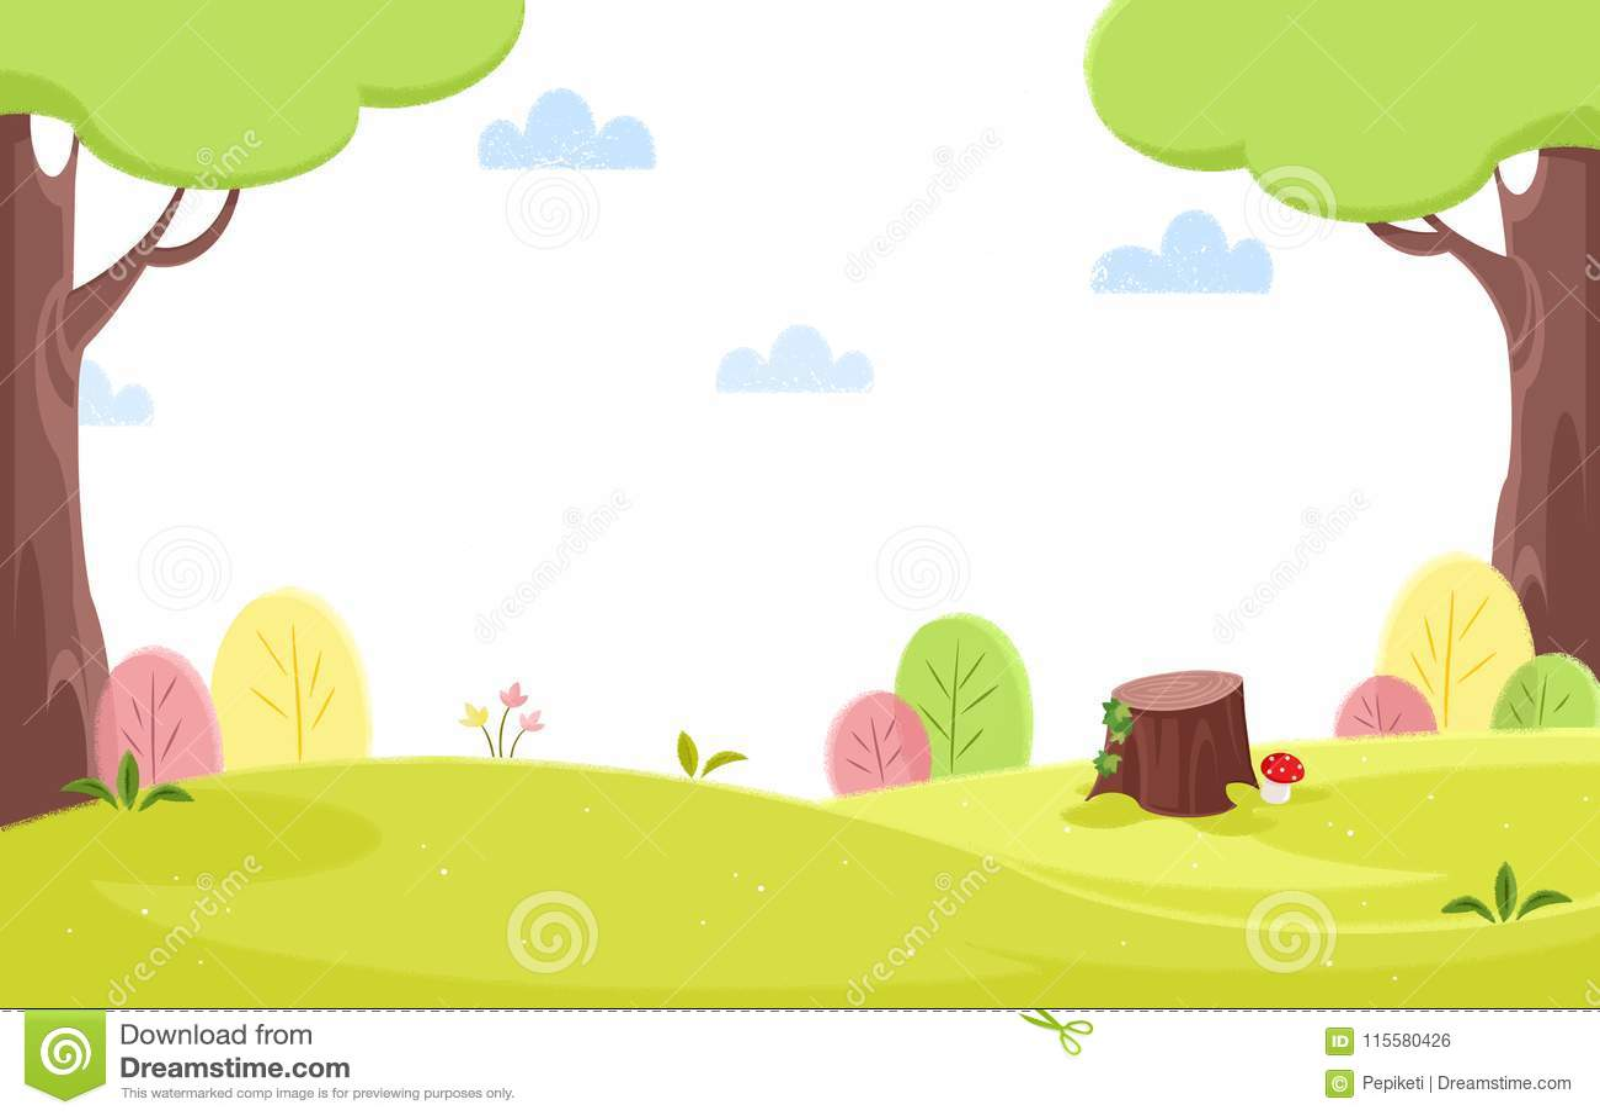 Spring Time Ln The Spring Garden Background Illustration Stock